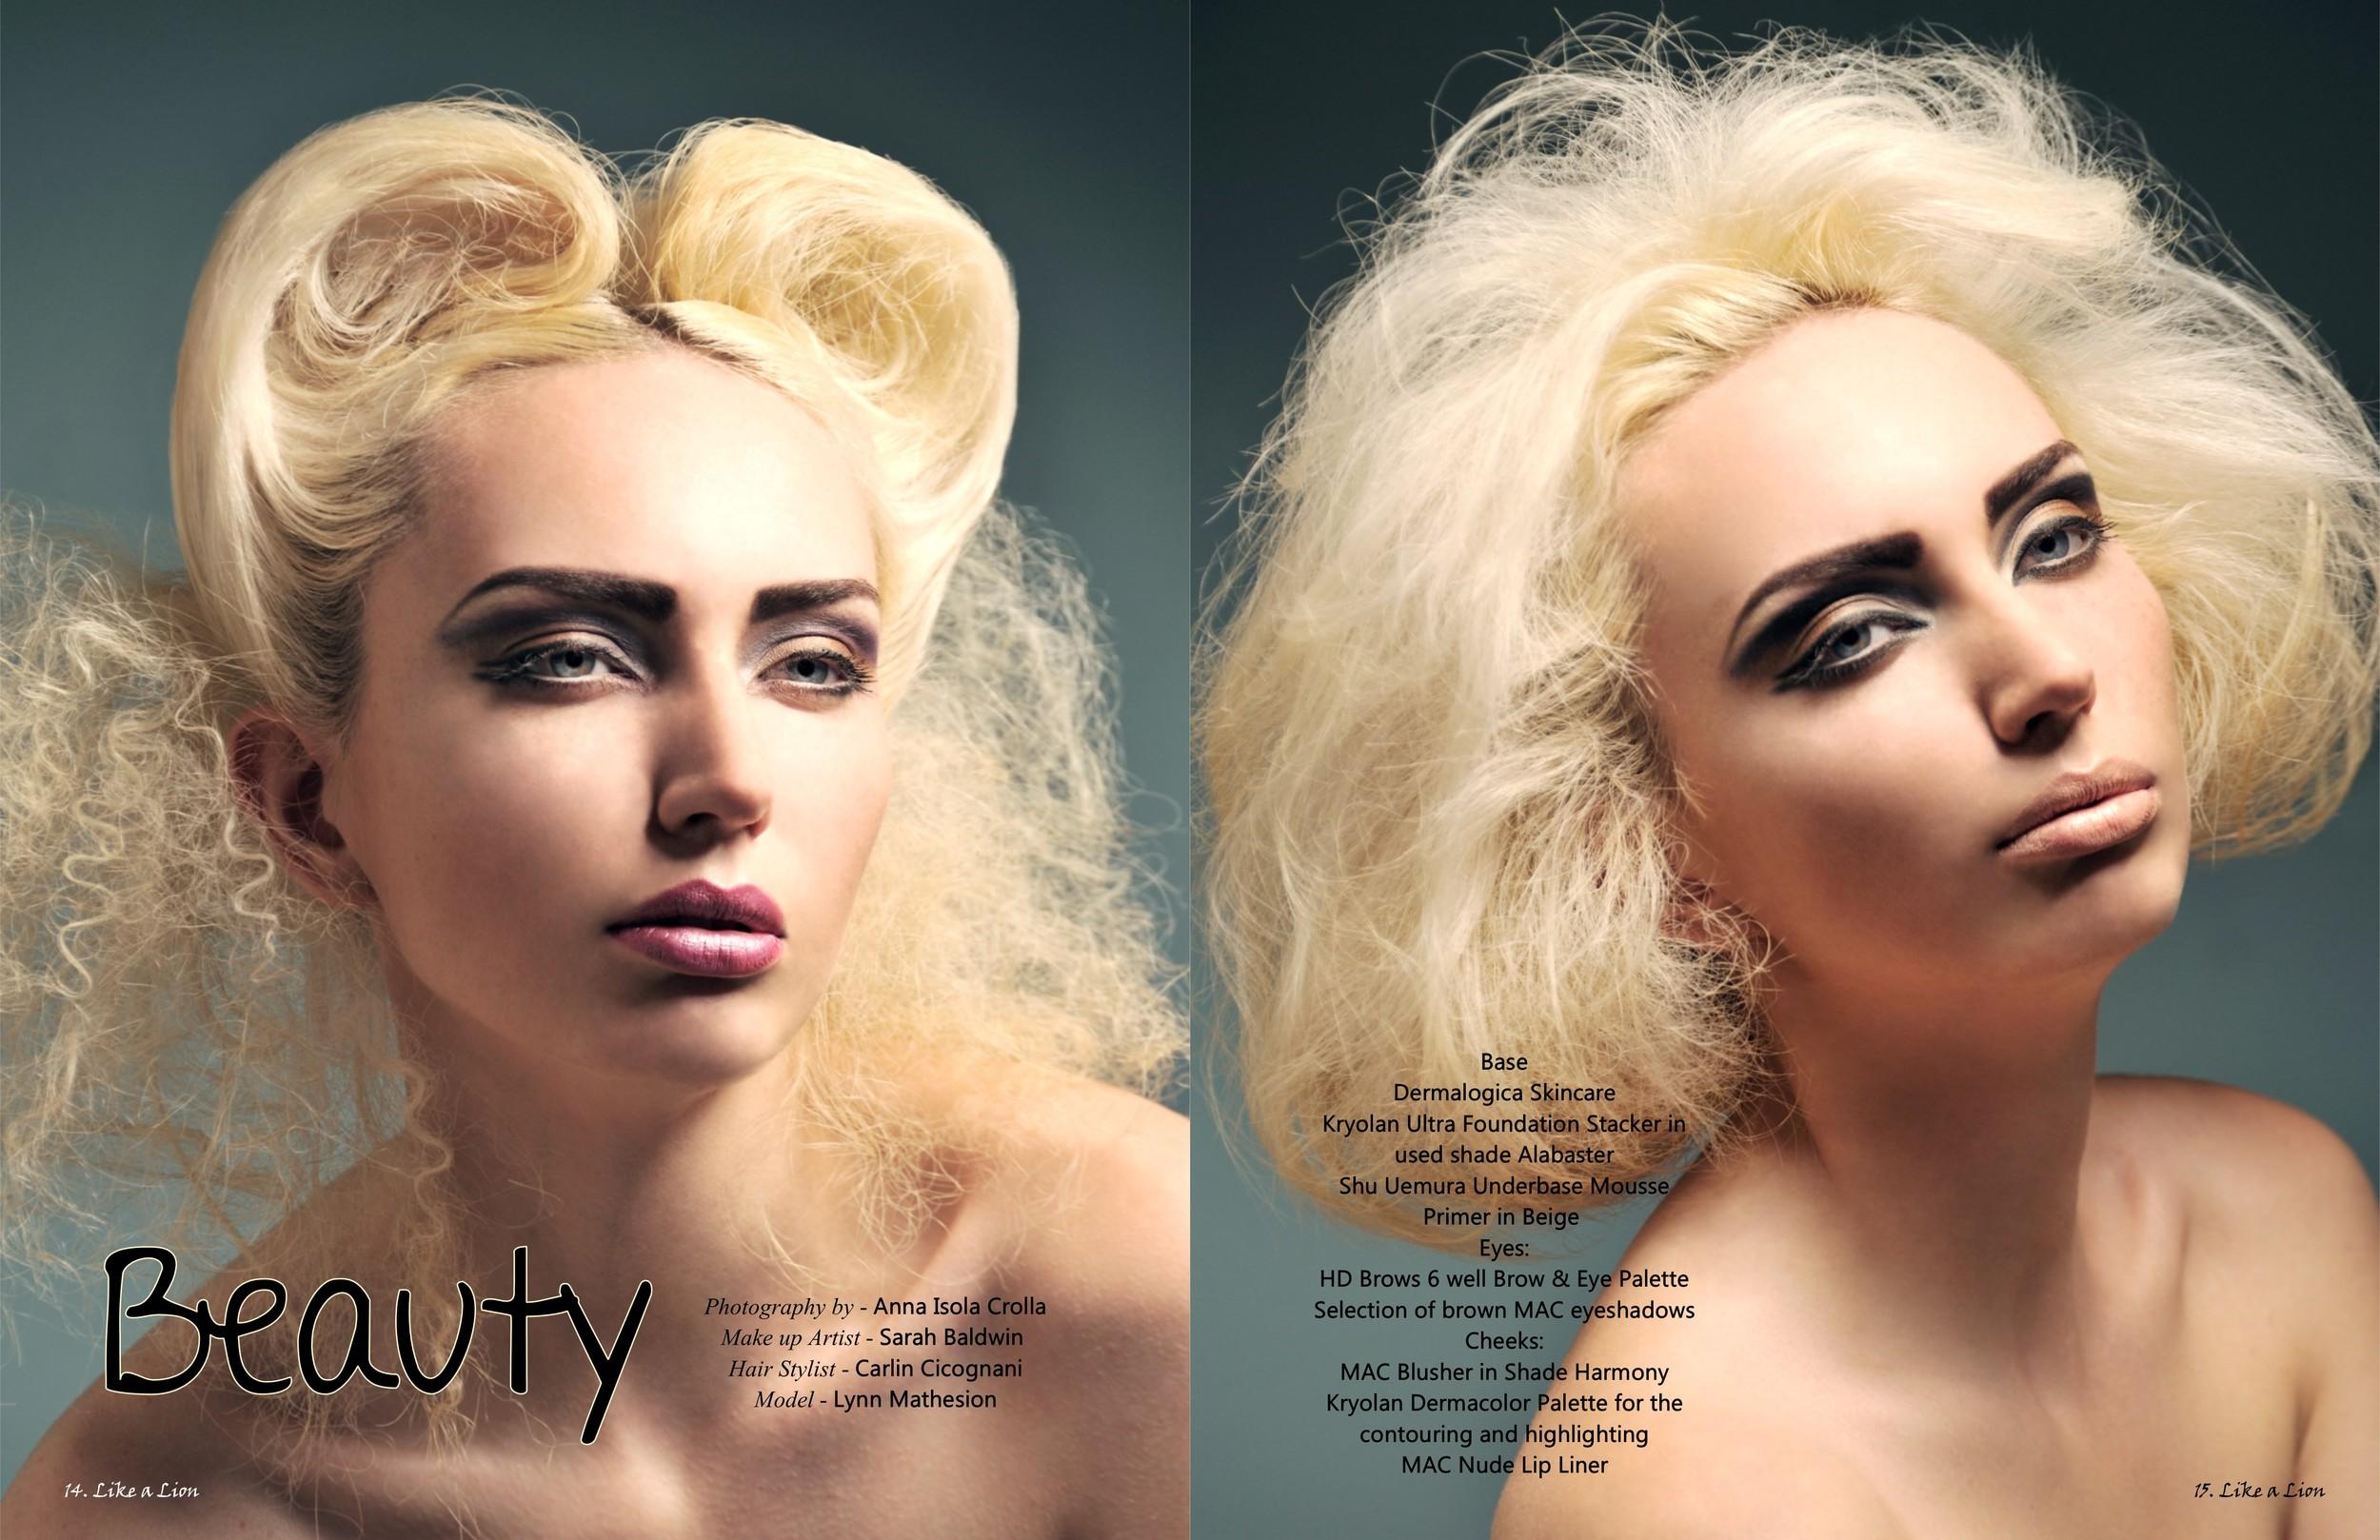 Published work for Like A Lion Magazine July 2013